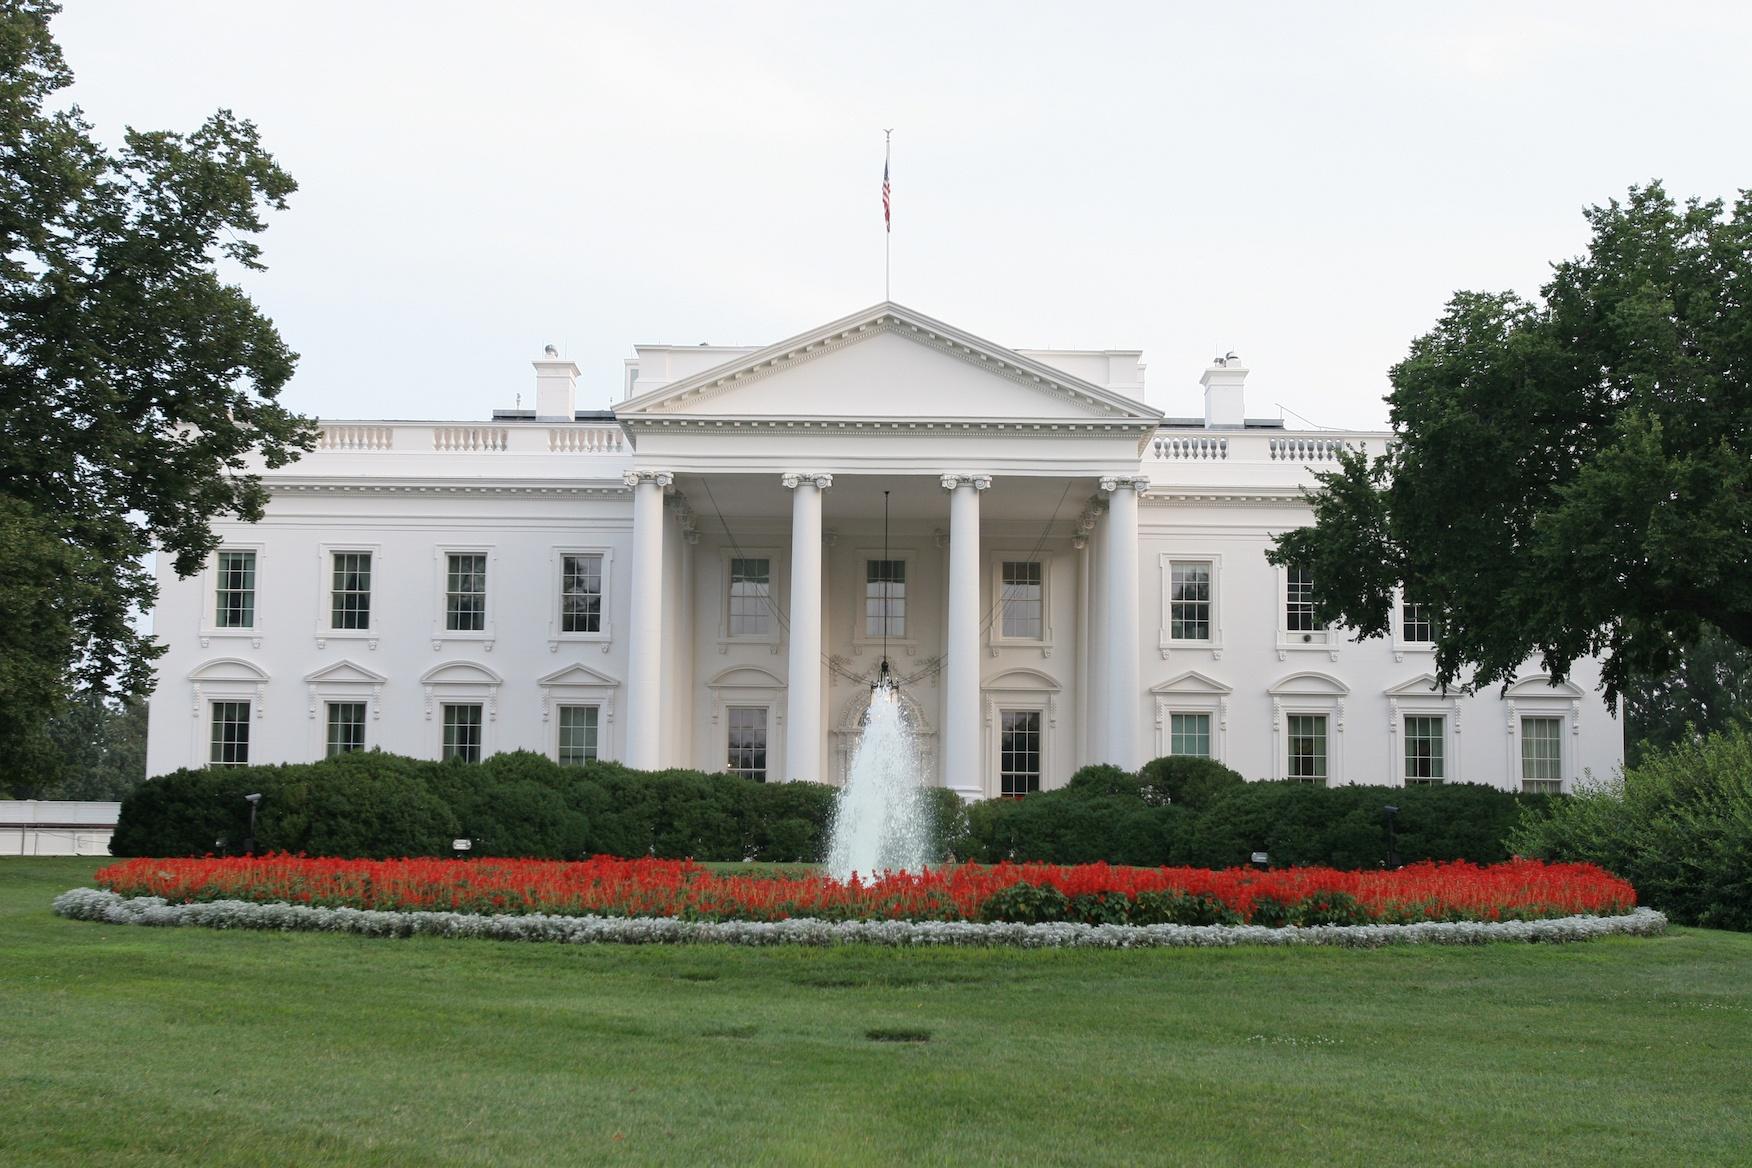 The White House in Washington, D.C.